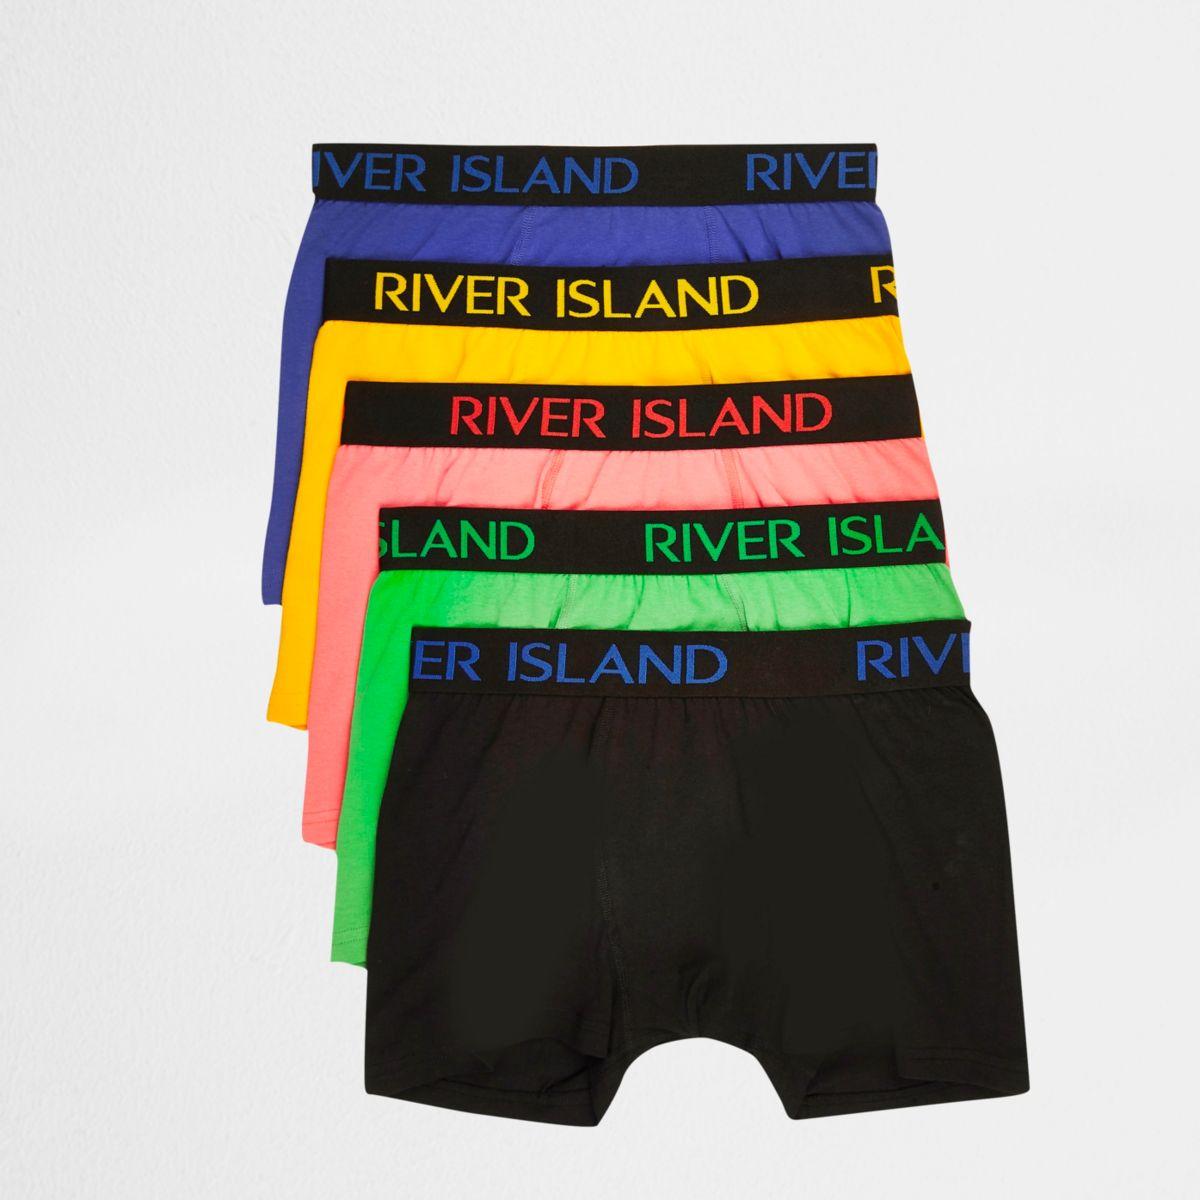 RI – Lot de boxers bleus multicolores